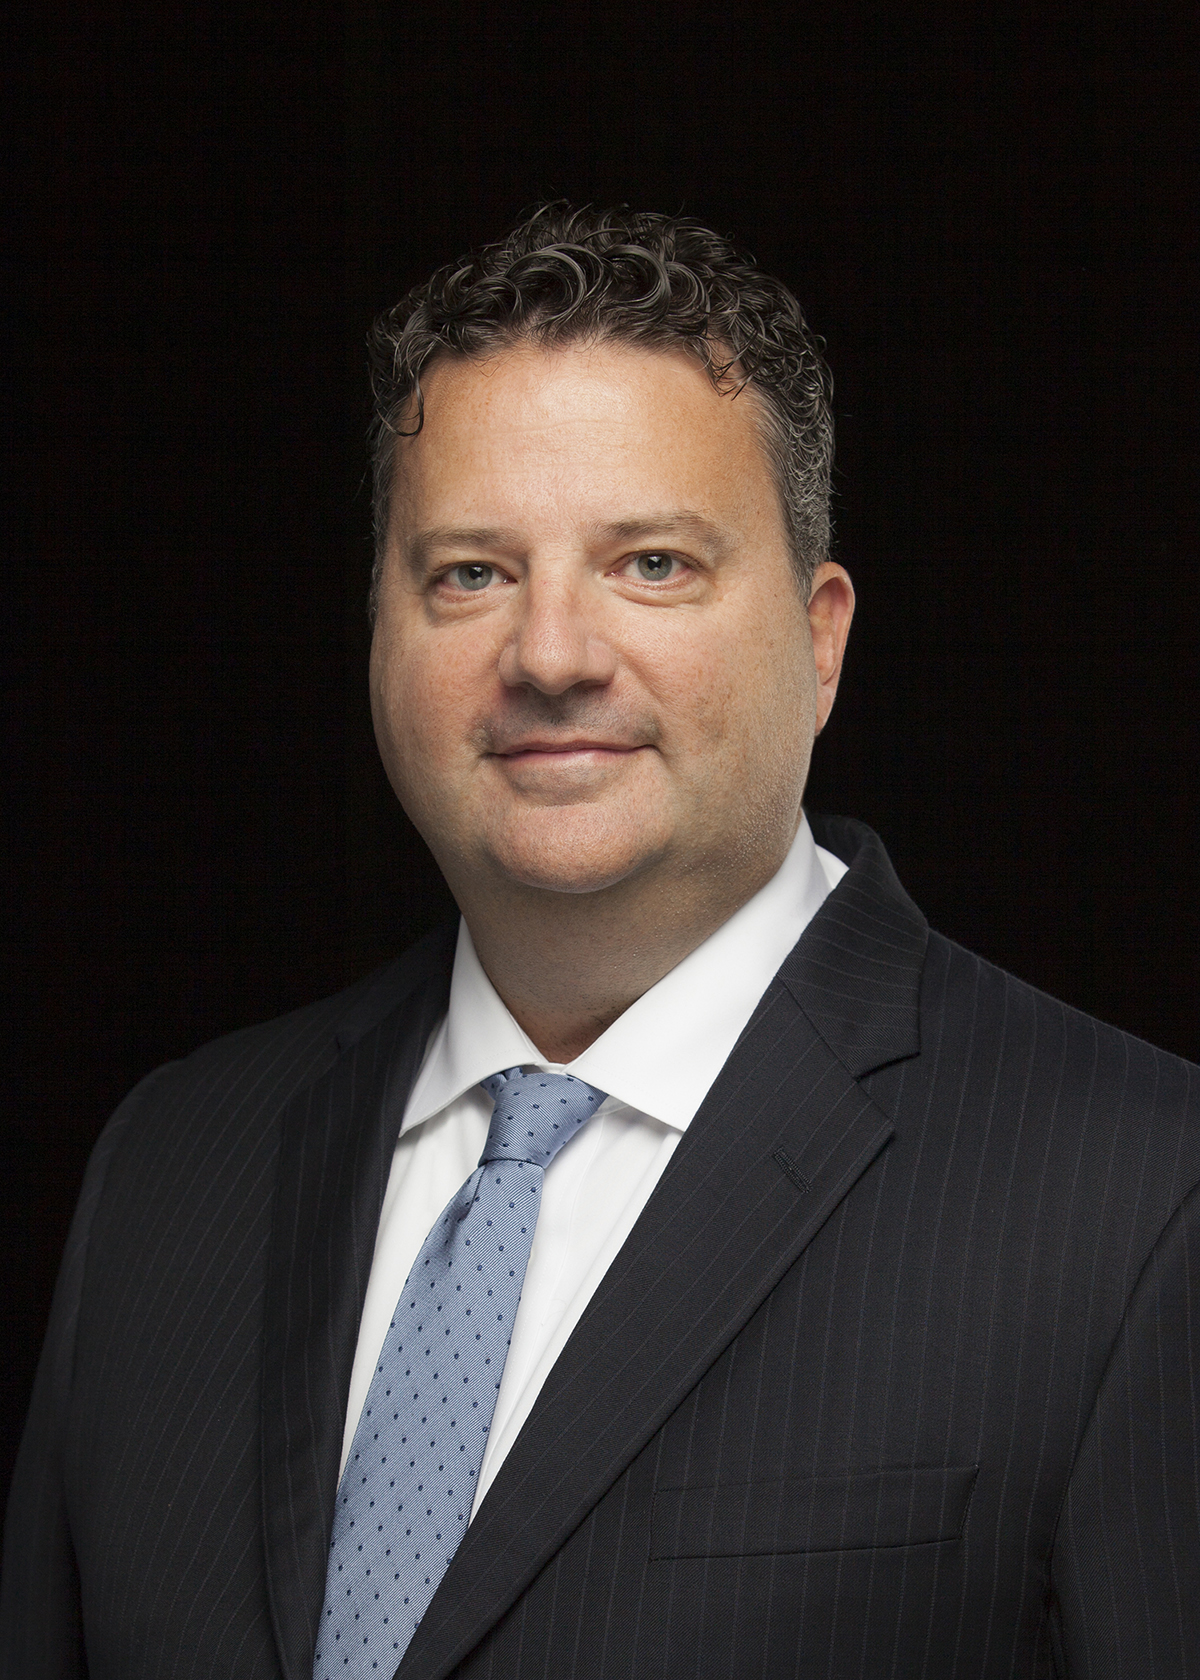 Scott Trezise, executive vice president of human resources at CenturyLink